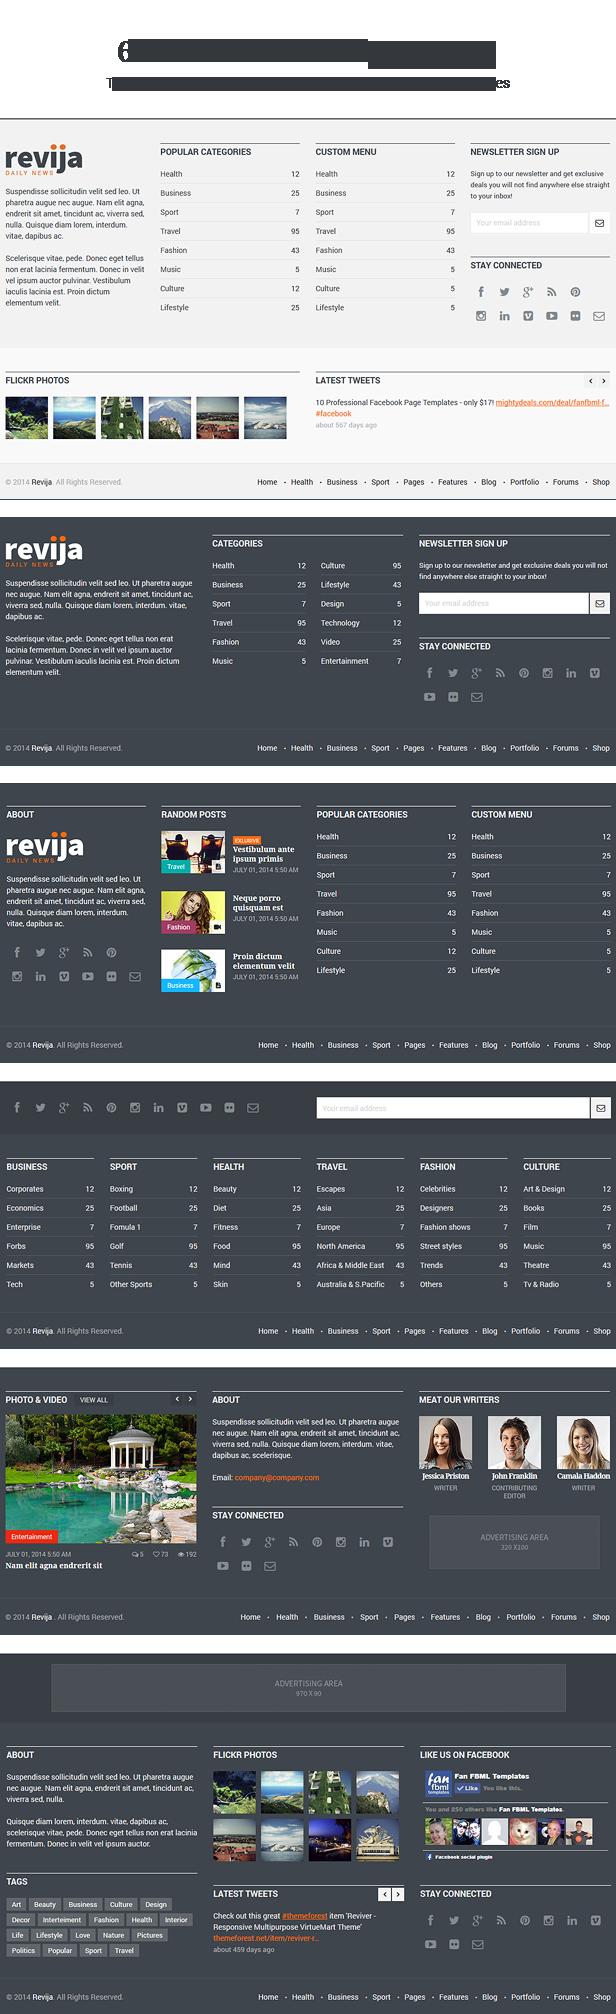 Revija - Premium Blog/Magazine HTML Template - 7